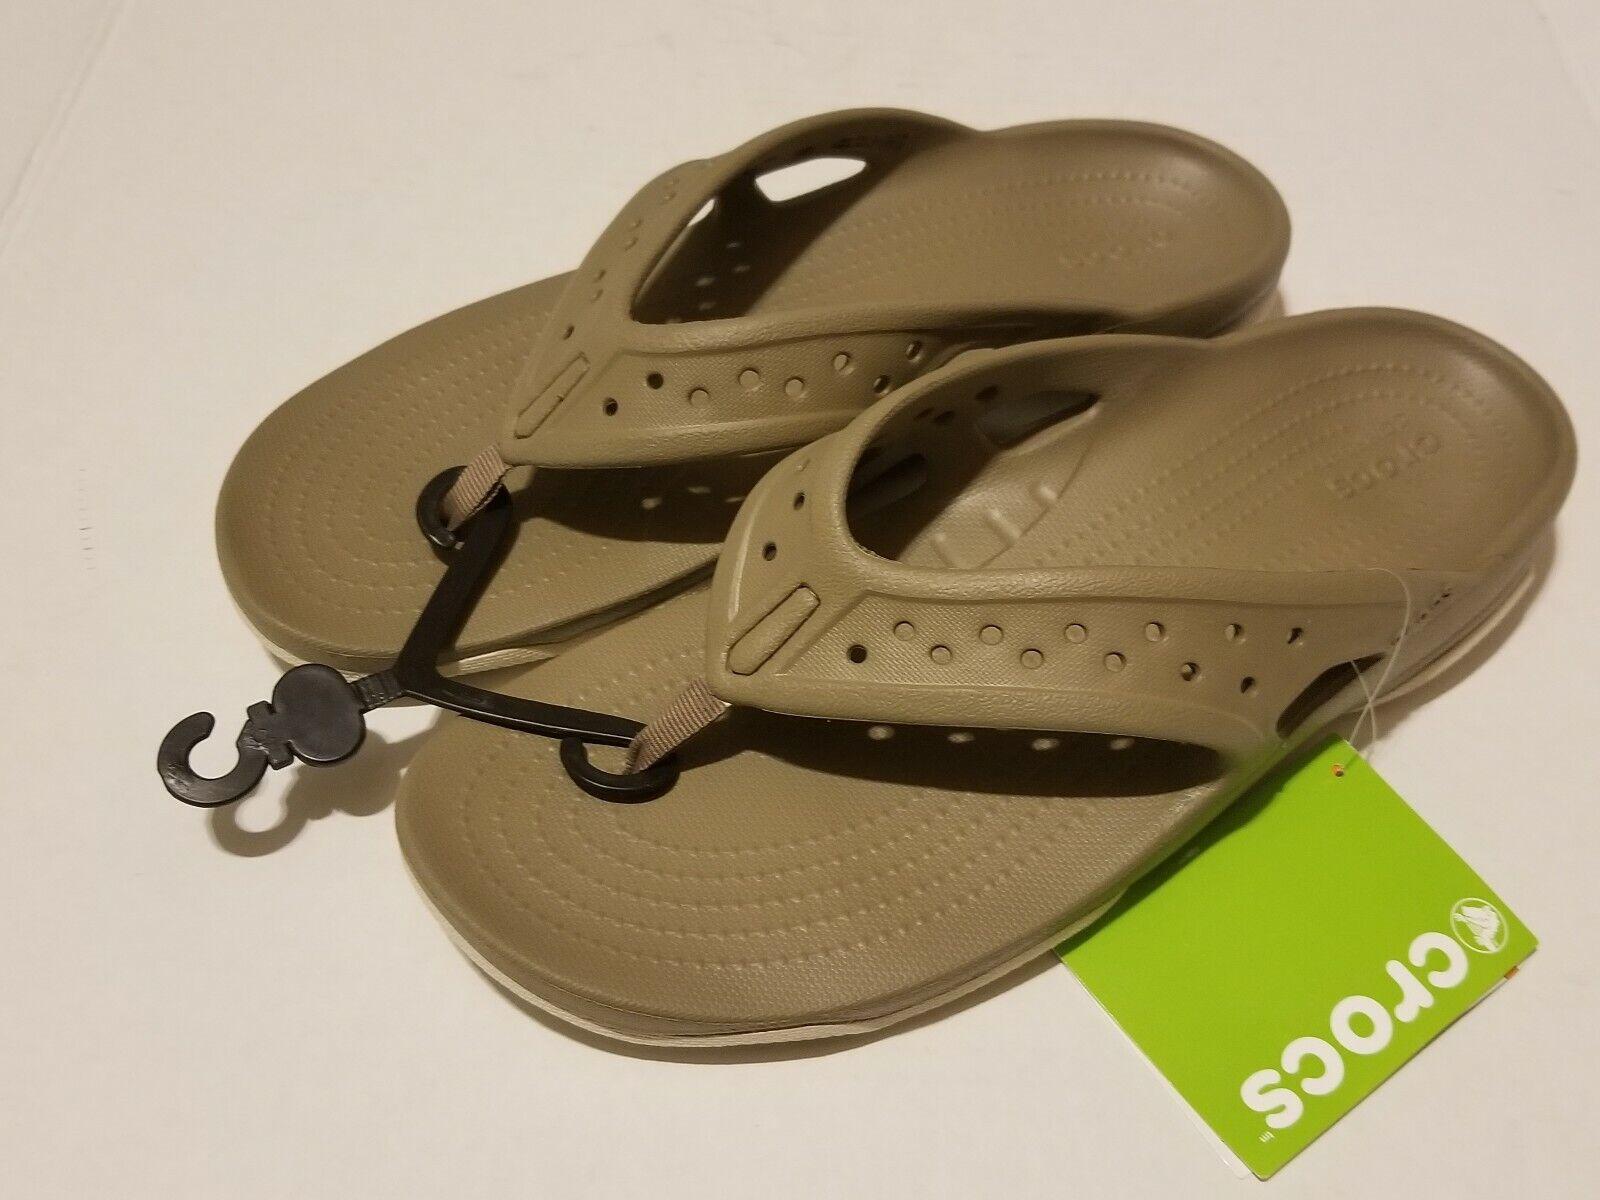 Men's Crocs Swiftwater Deck Flip Flop Sandal  Khaki/Stucco